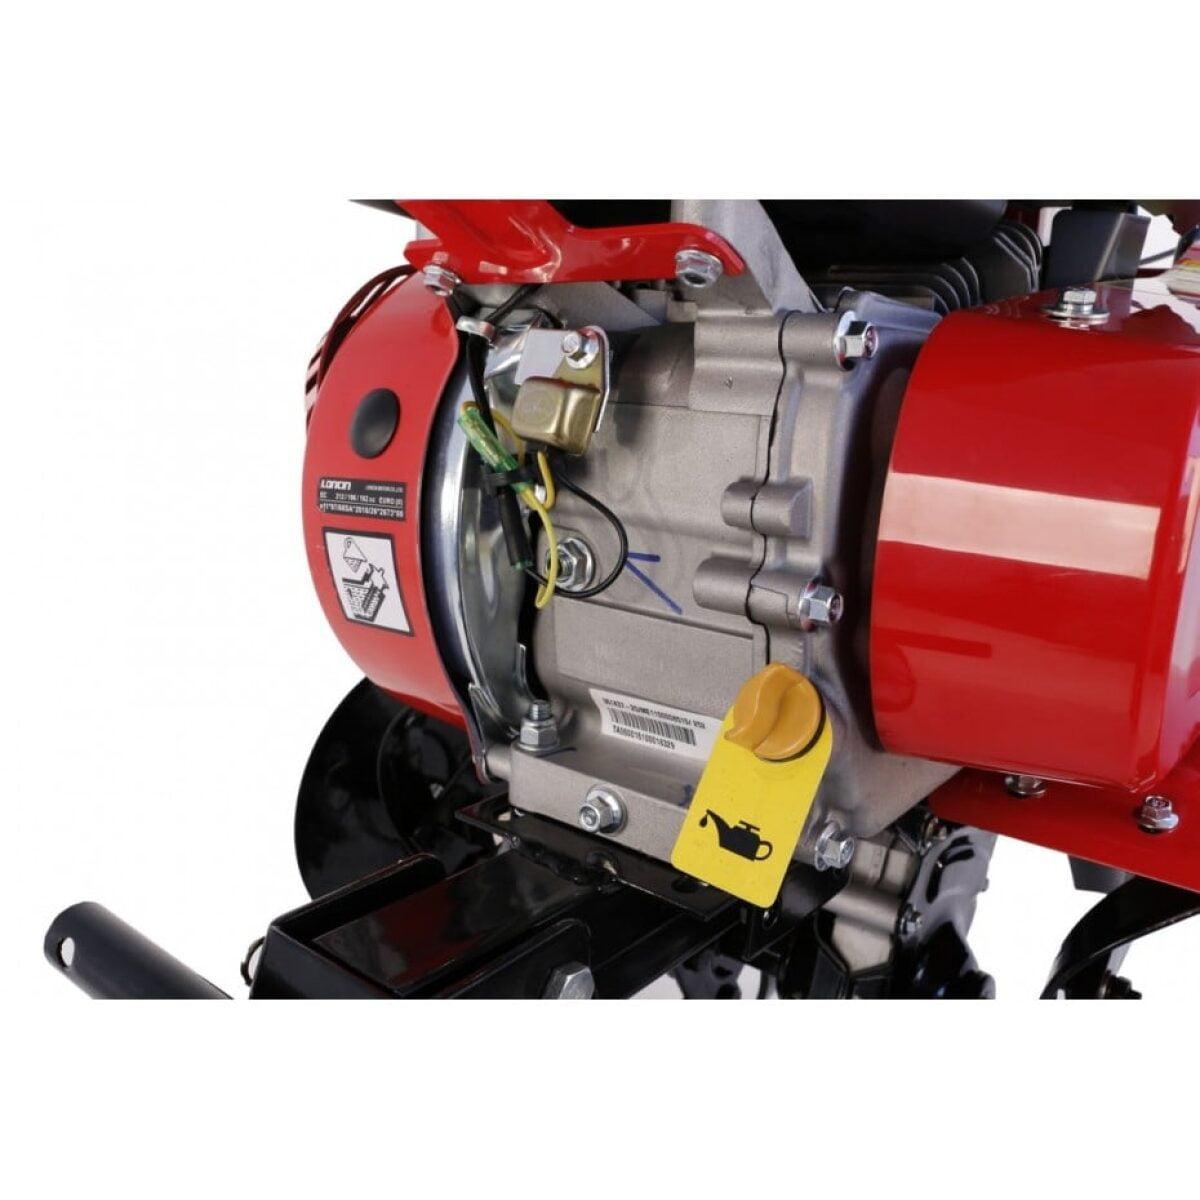 motocultor loncin lc750 7cp o mac.ro 5 5